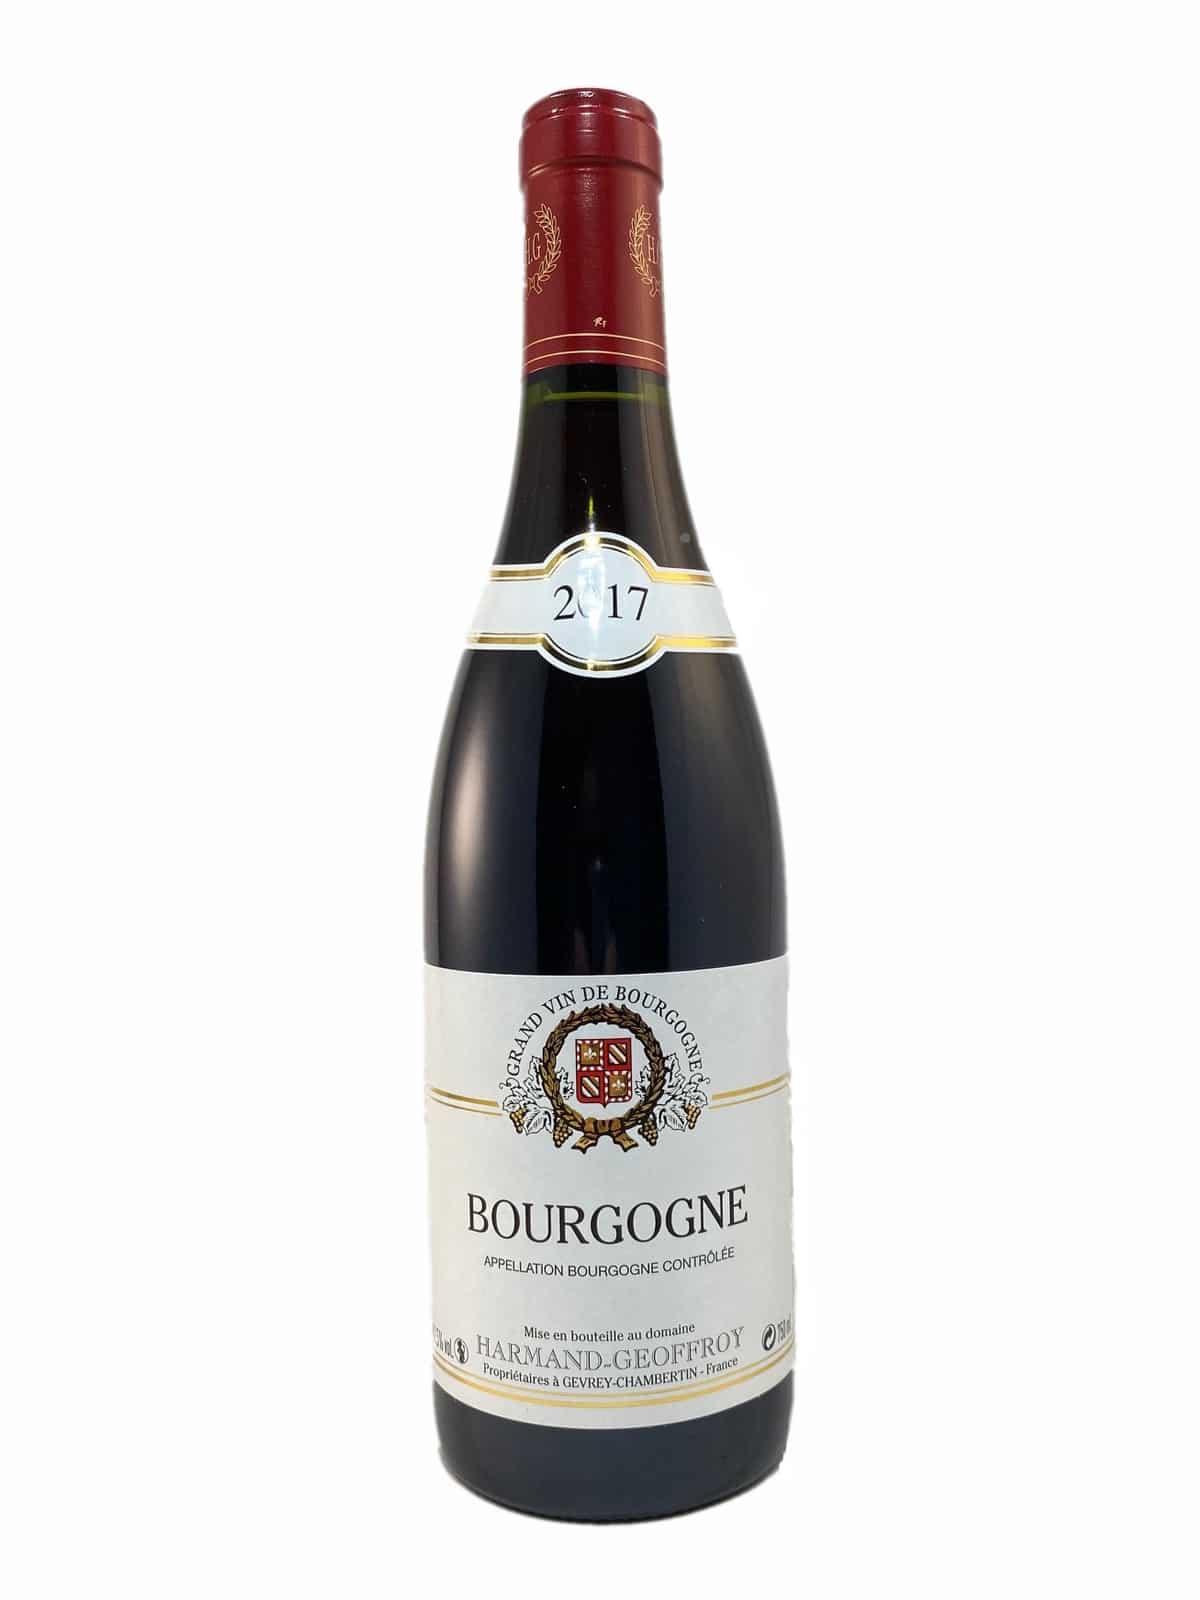 bourgogne 2017 domaine harmand geoffroy grand vin de bourgogne rouge pas cher